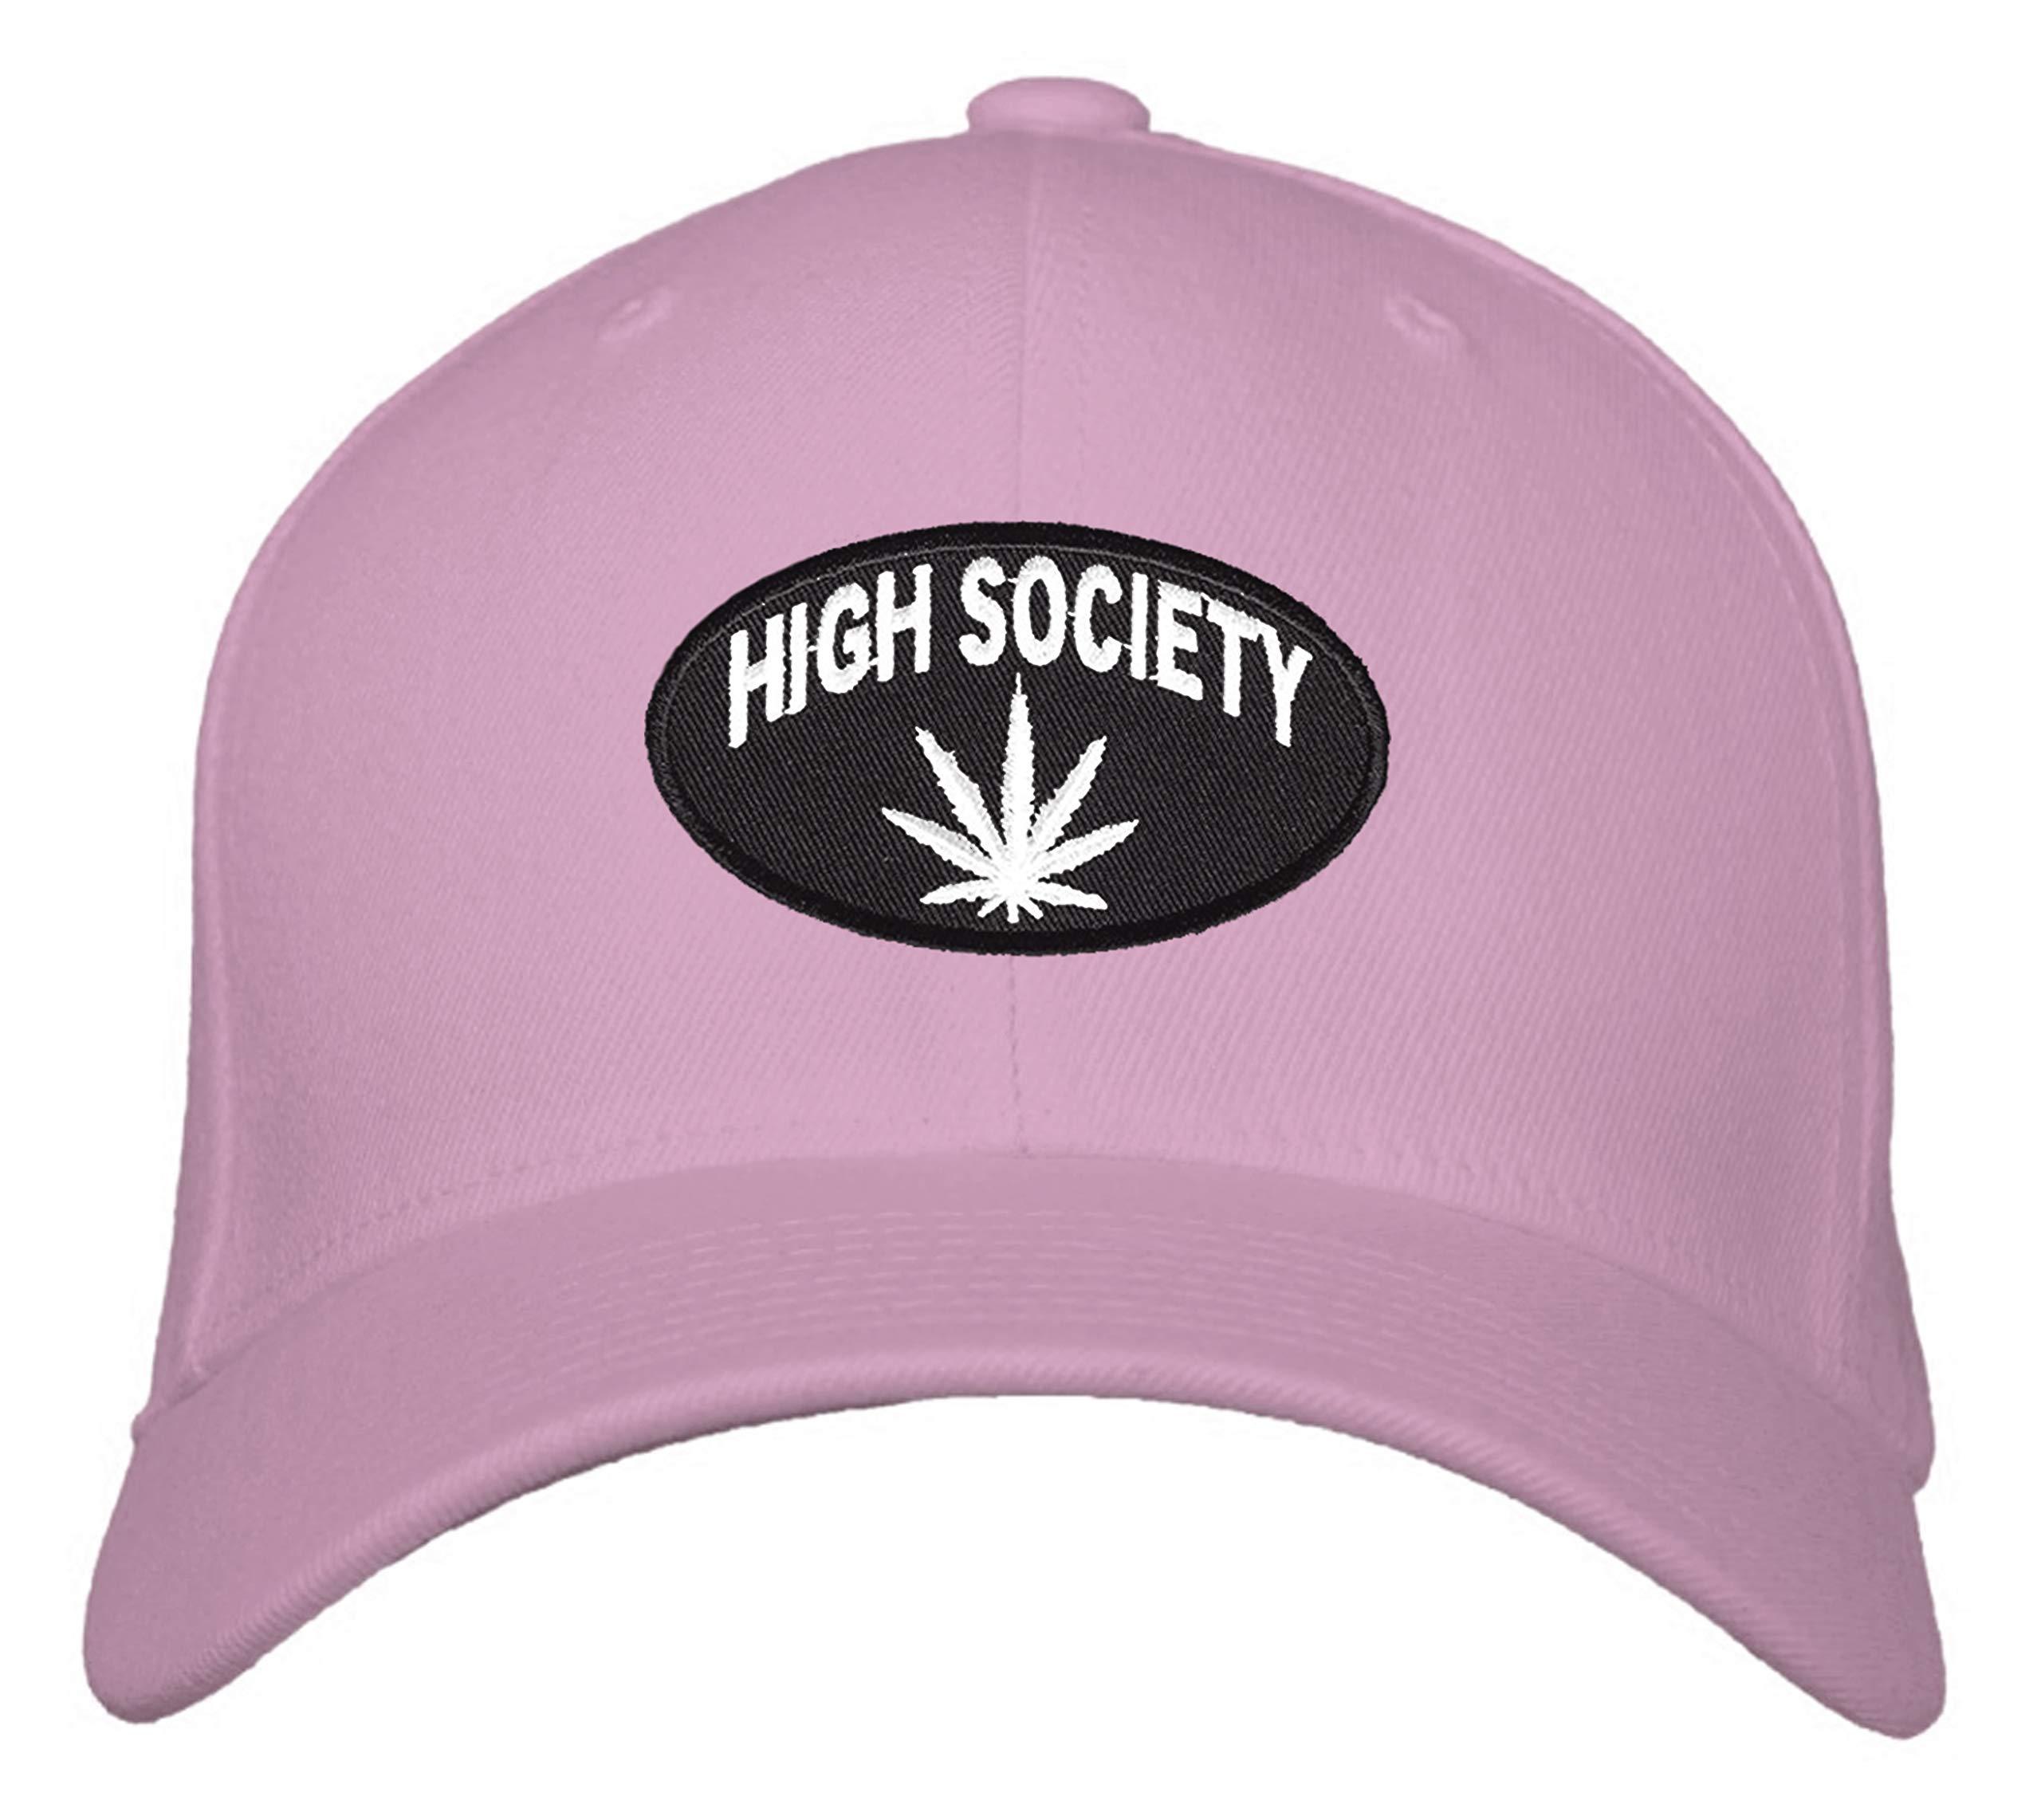 High Society Hat – Adjustable Women's Cap (Pink) Marijuana Cannabis Pot Leaf